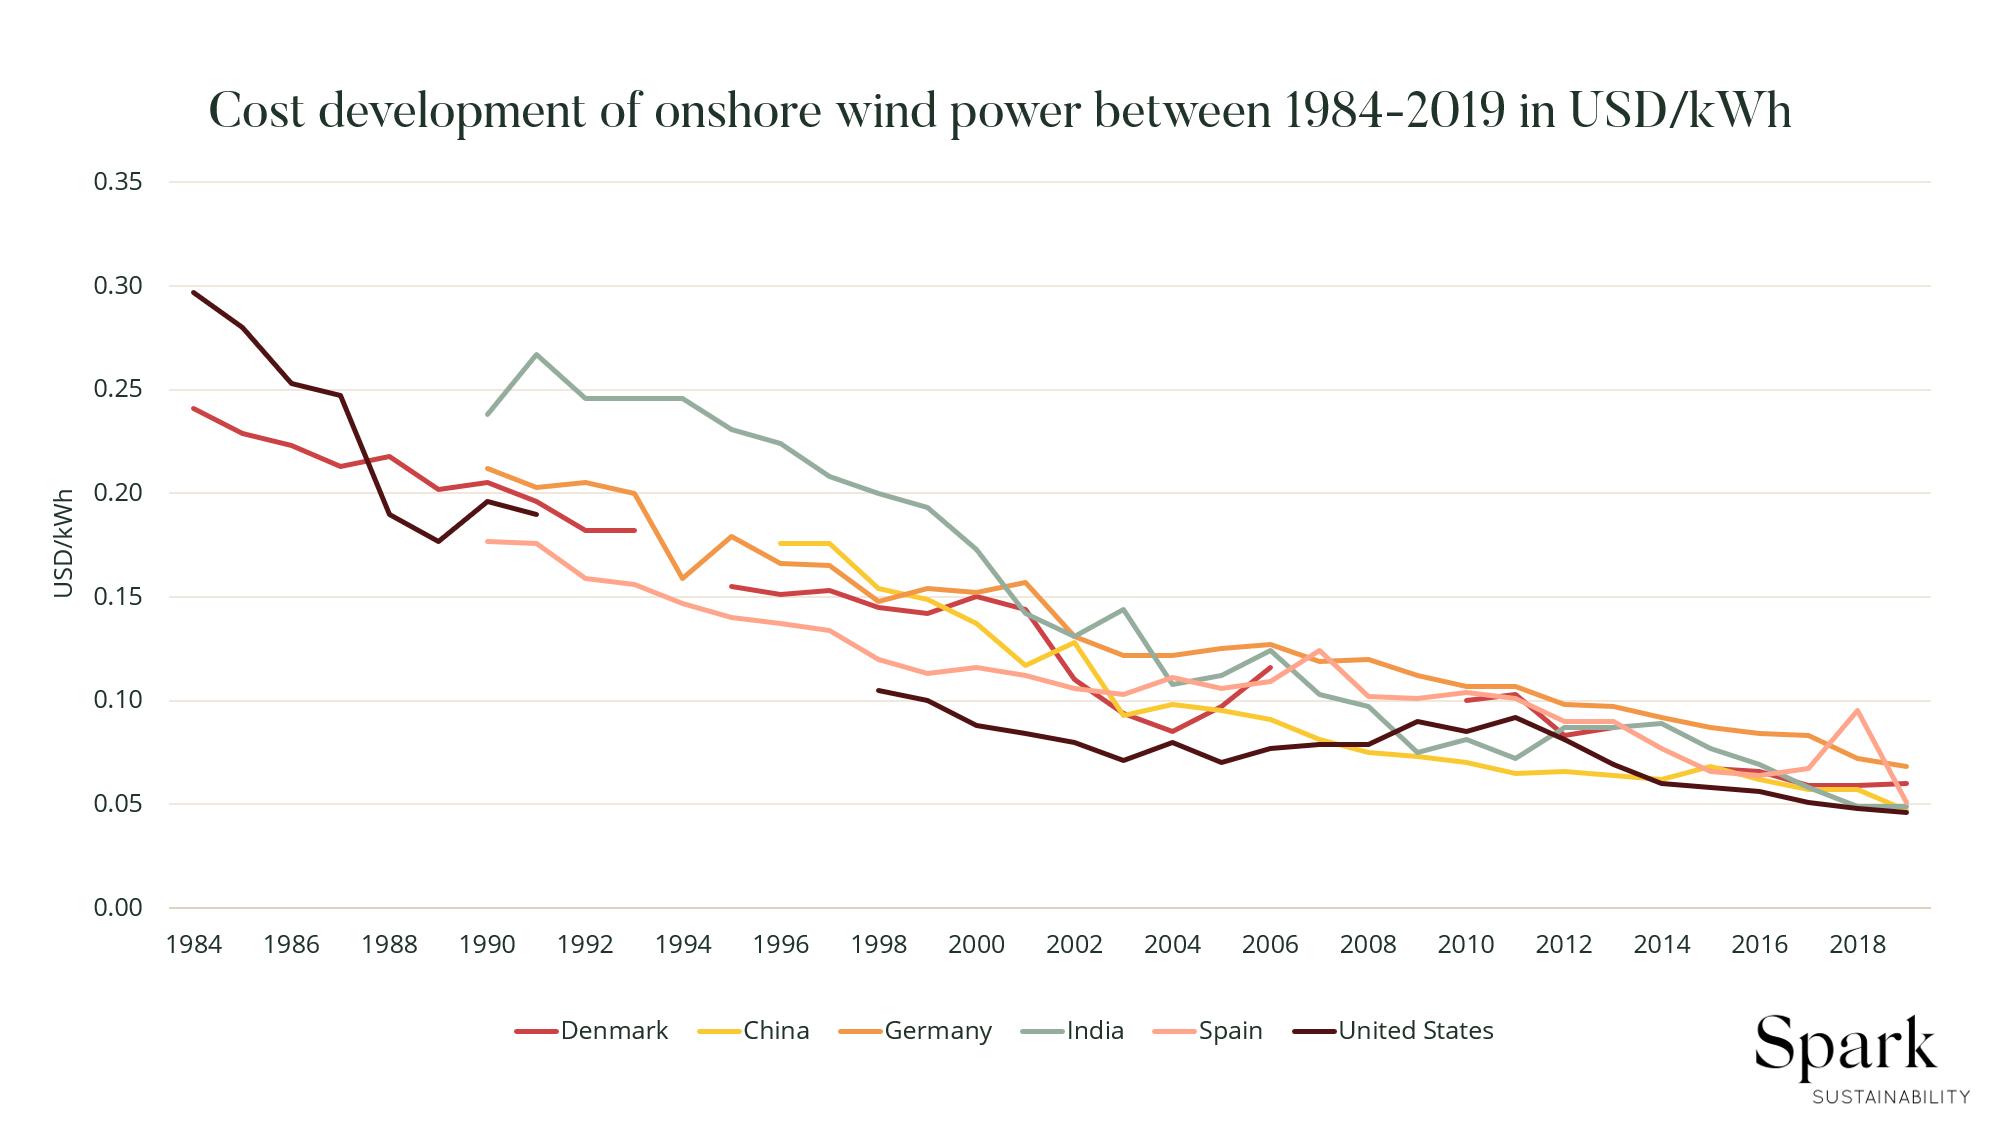 Cost development of onshore wind power.